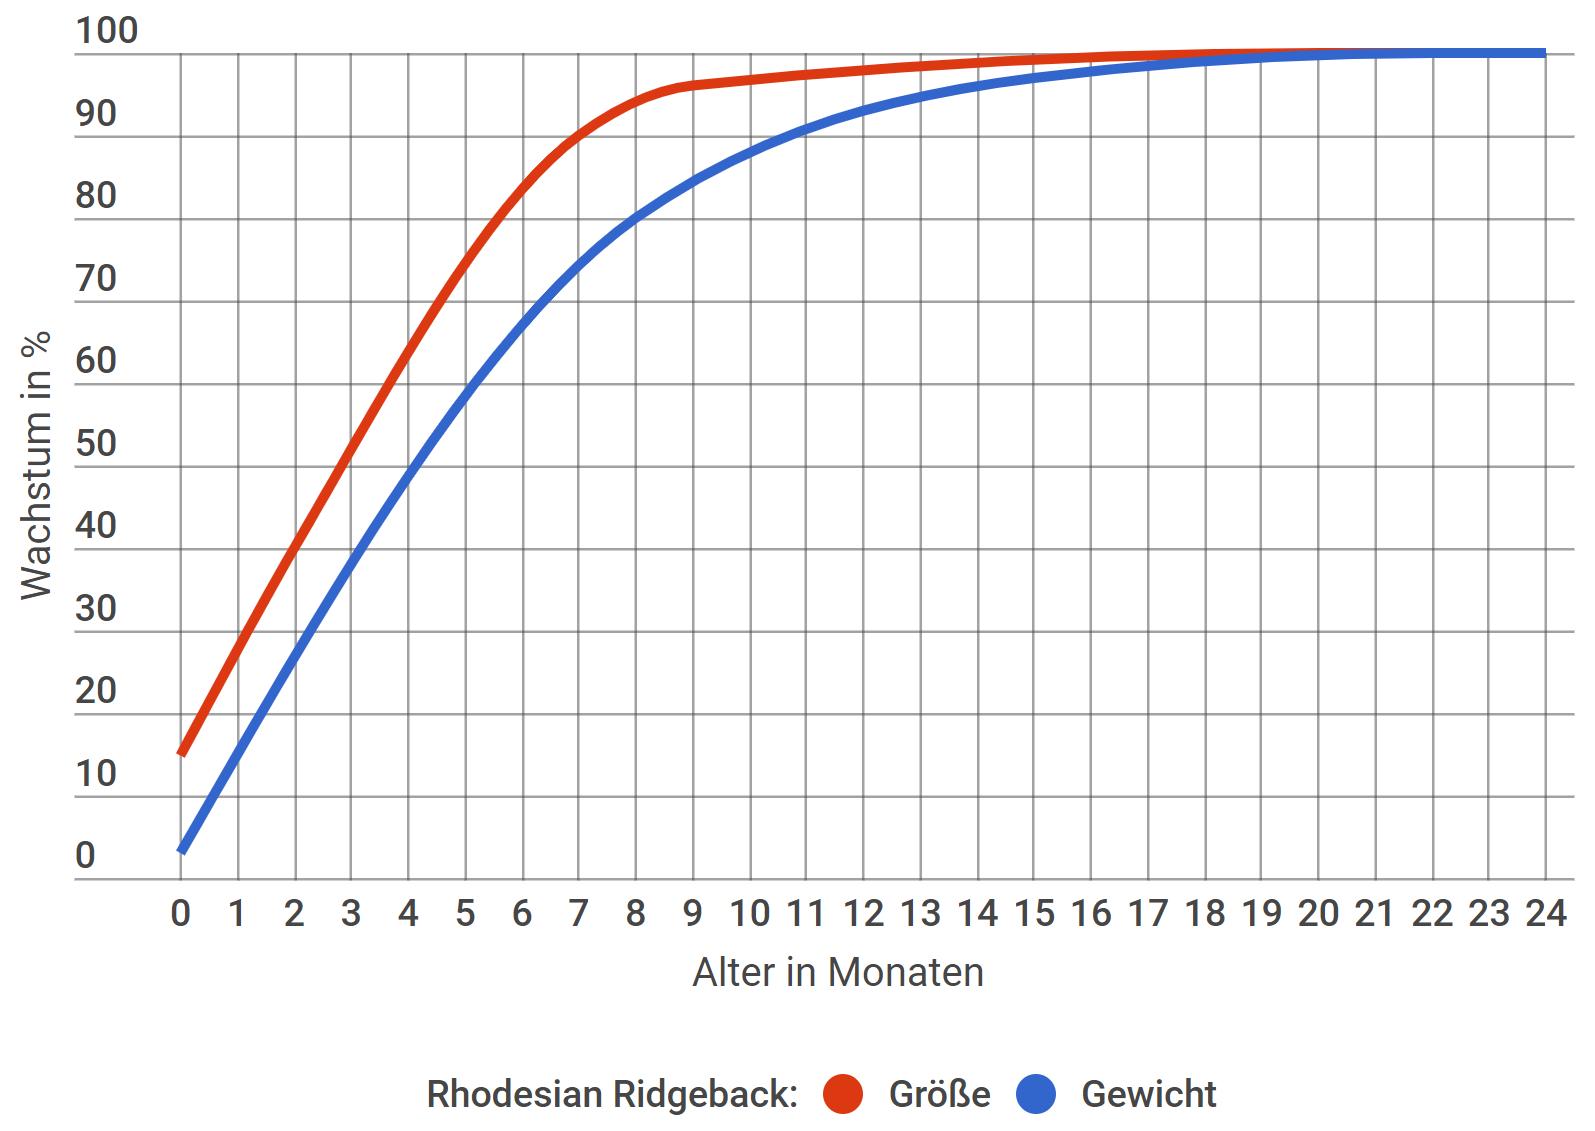 Rhodesian Ridgeback Wachstum in Prozent